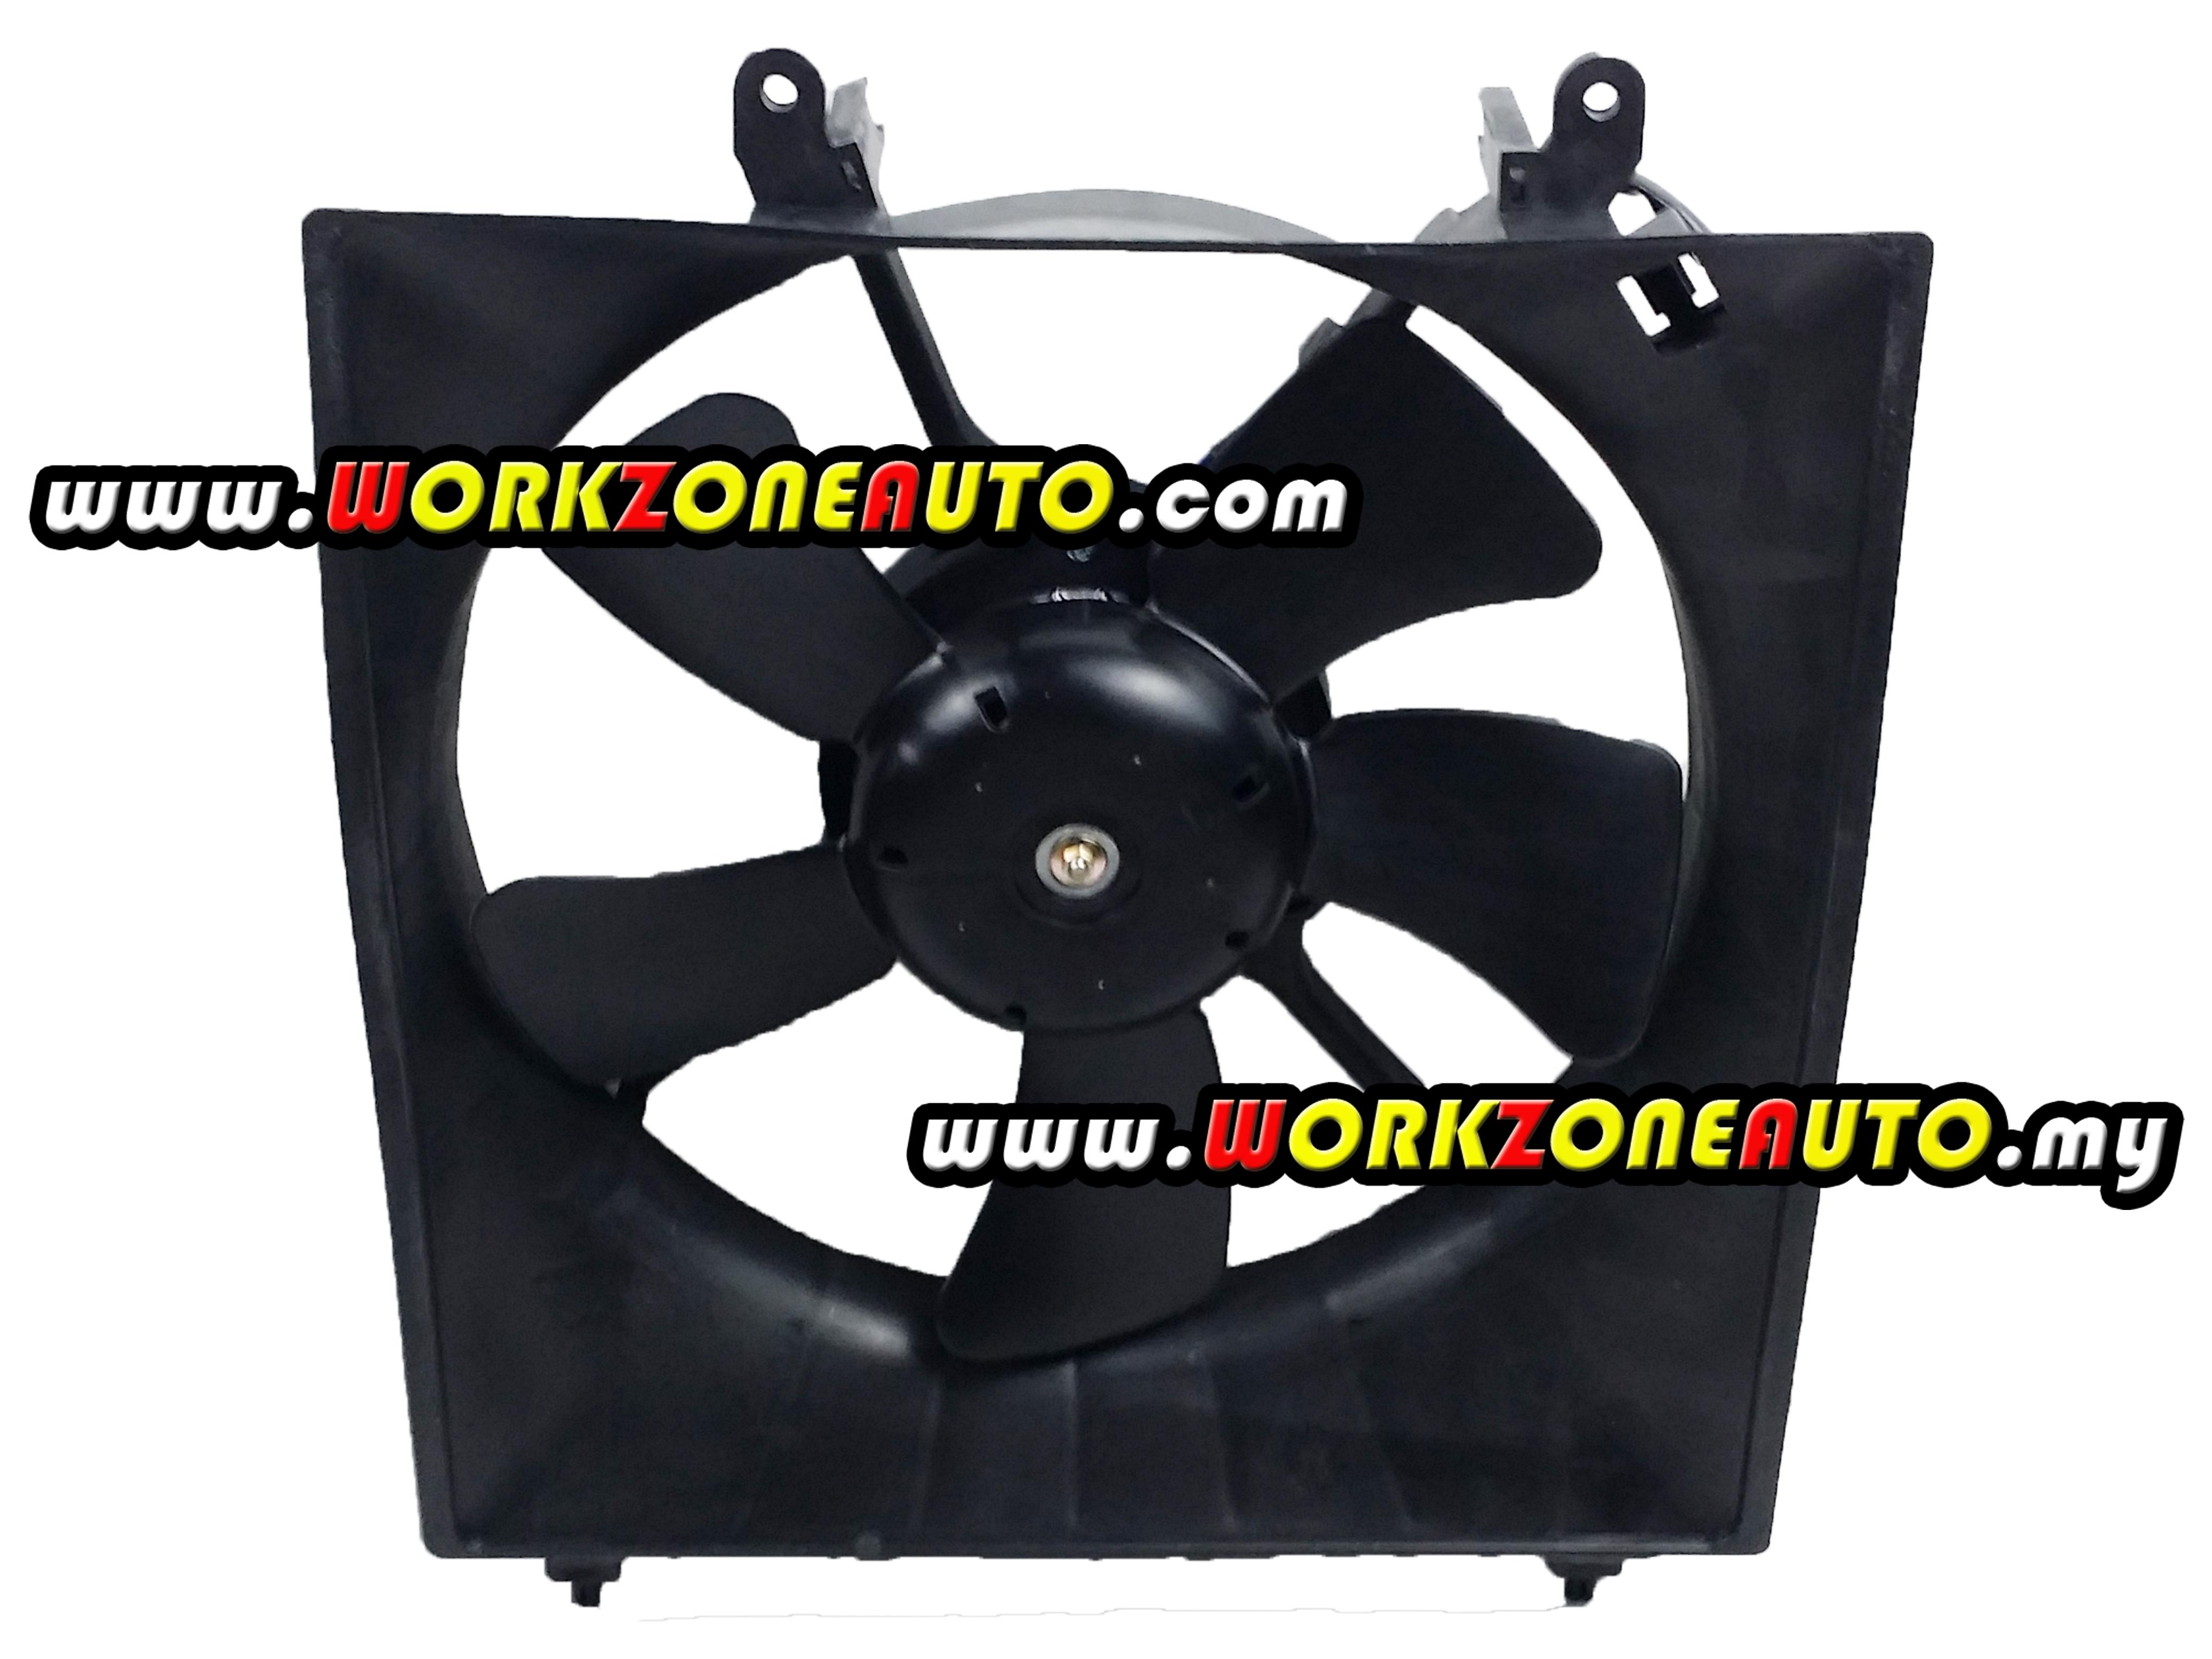 Proton Gen-2 Saga BLM Persona Manual Denso Type Radiator Fan Assembly Taiwan